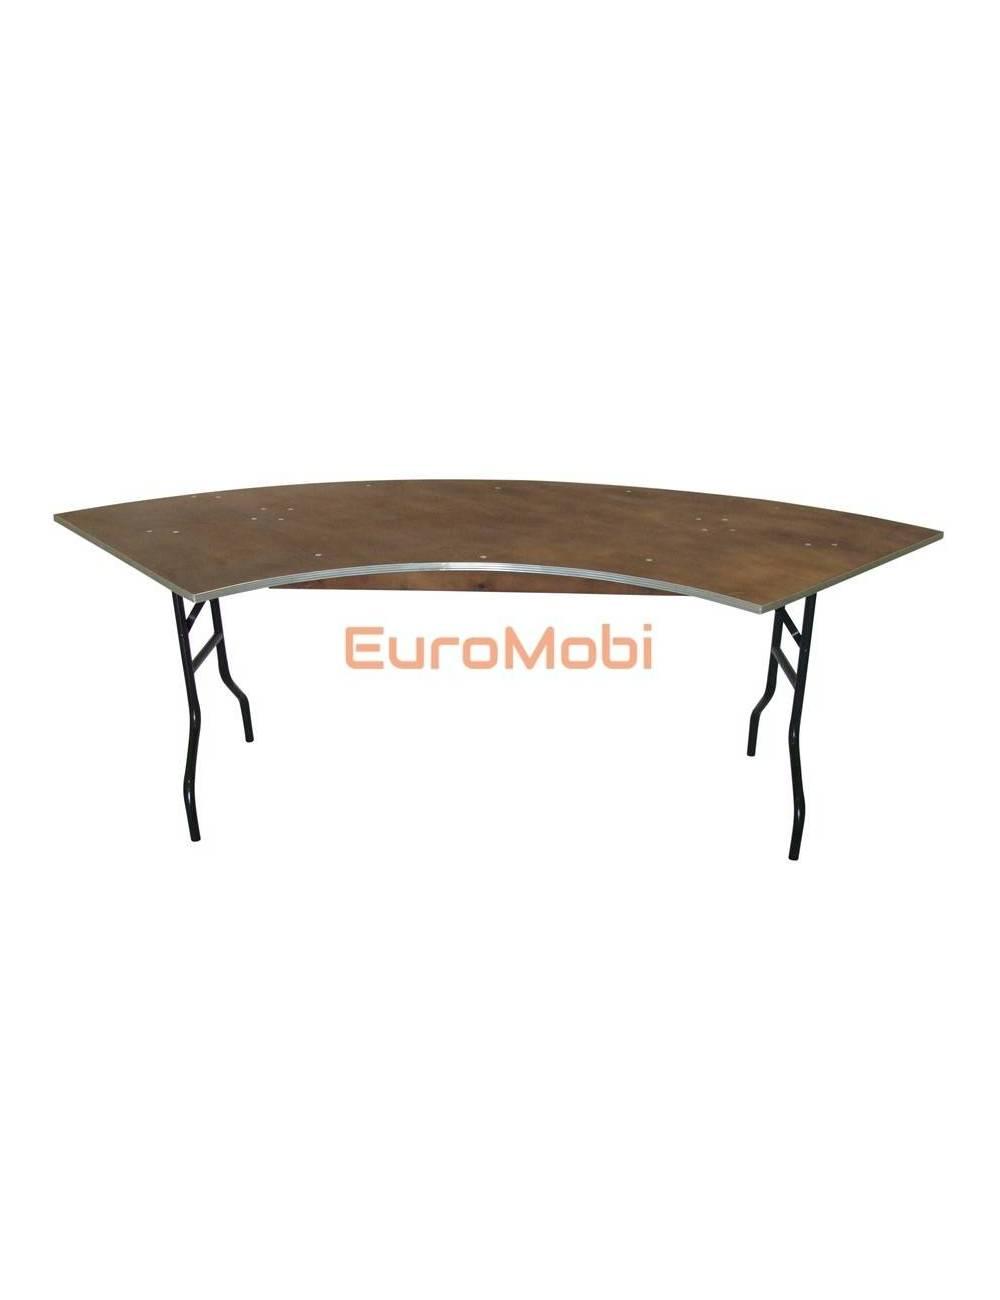 Tacoma folding table bent 236 x 76cm (bent) round unfolded